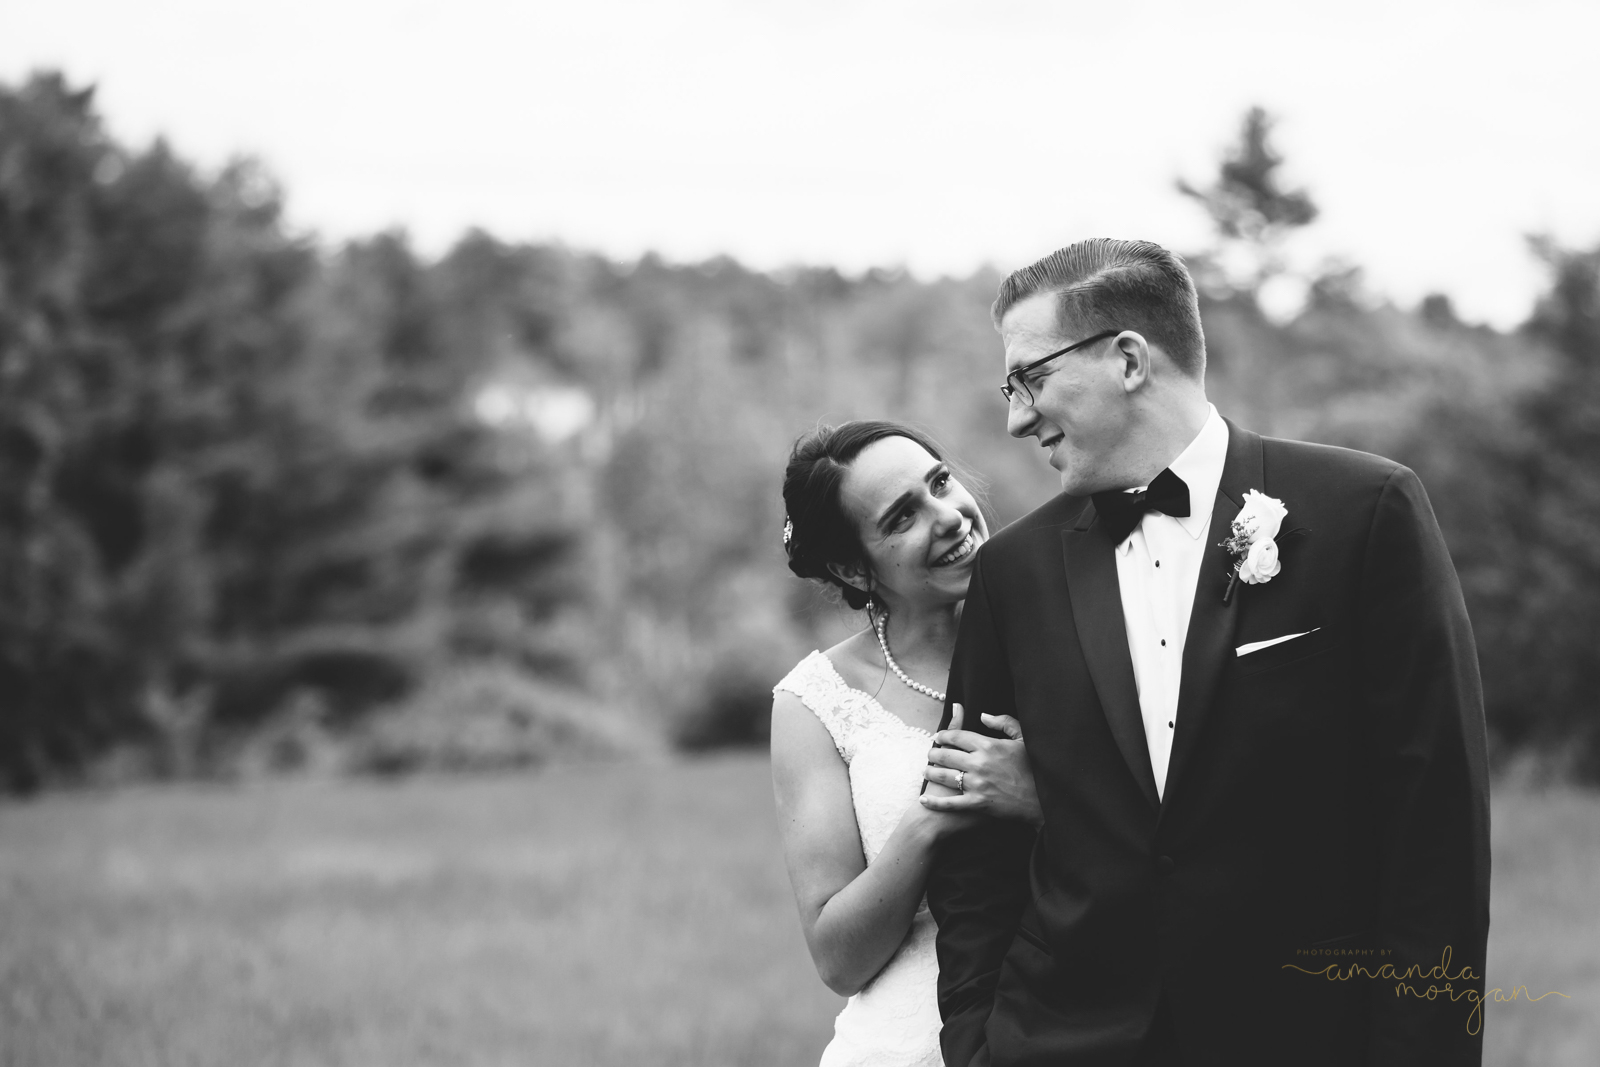 Publick-House-Wedding-Amanda-Morgan-22.jpg